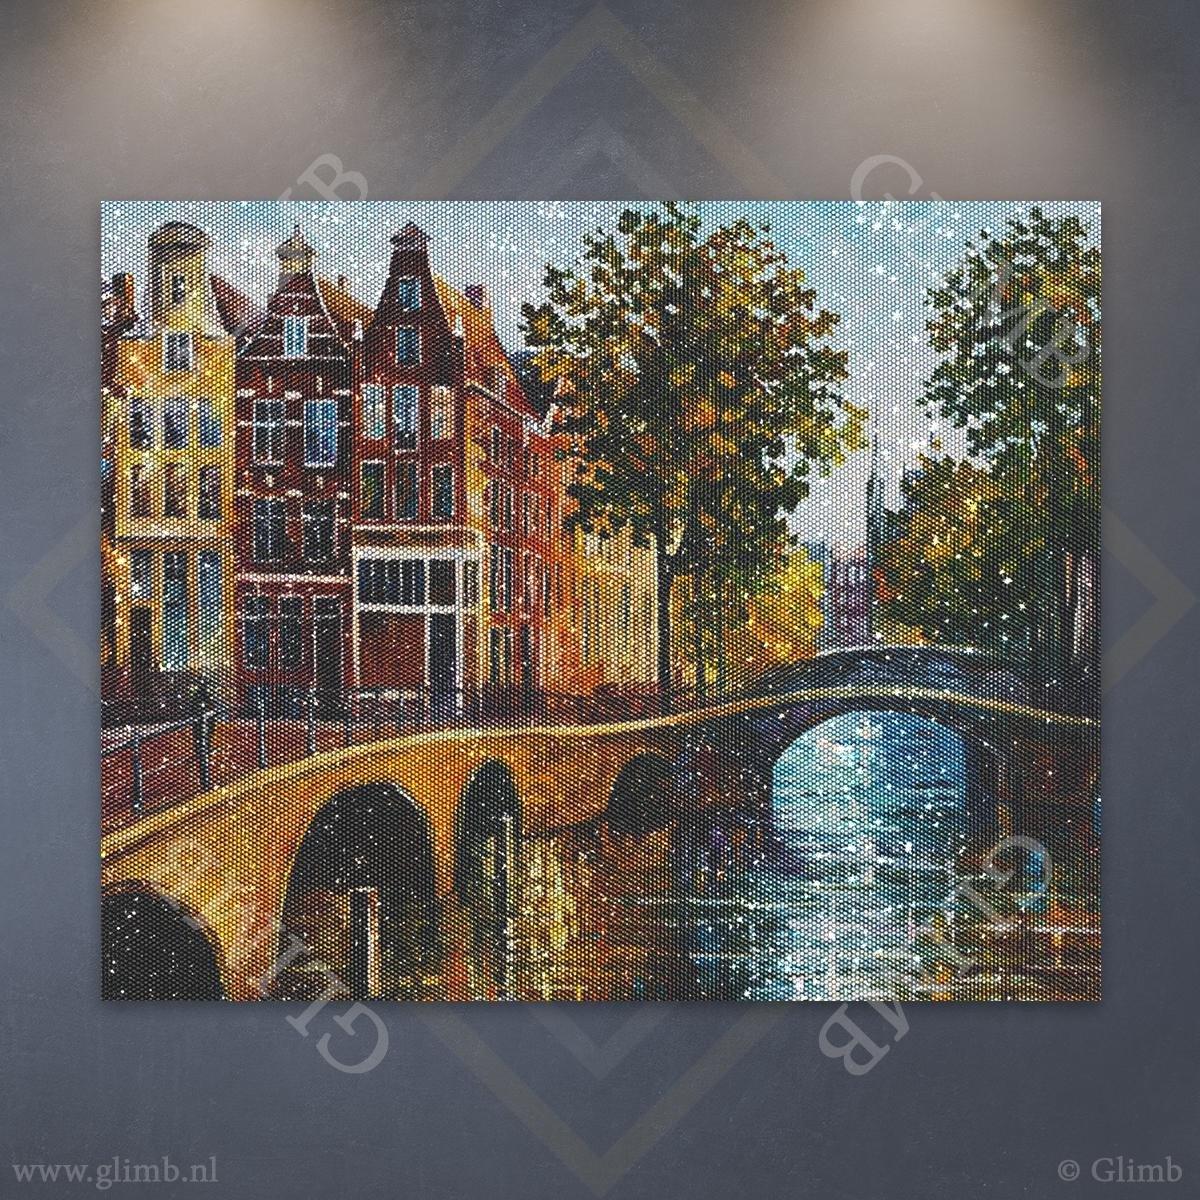 Glimb®   HQ Diamond Painting Pakket   Amsterdam   40x40cm   Vierkant   Volledig   Made in NL! // Diamond Painting - Diamond Painting Pakketten - Diamond Paint - Daimond Painting - Dotz -Diamond Schilderen - Diamond Painting Volwassenen